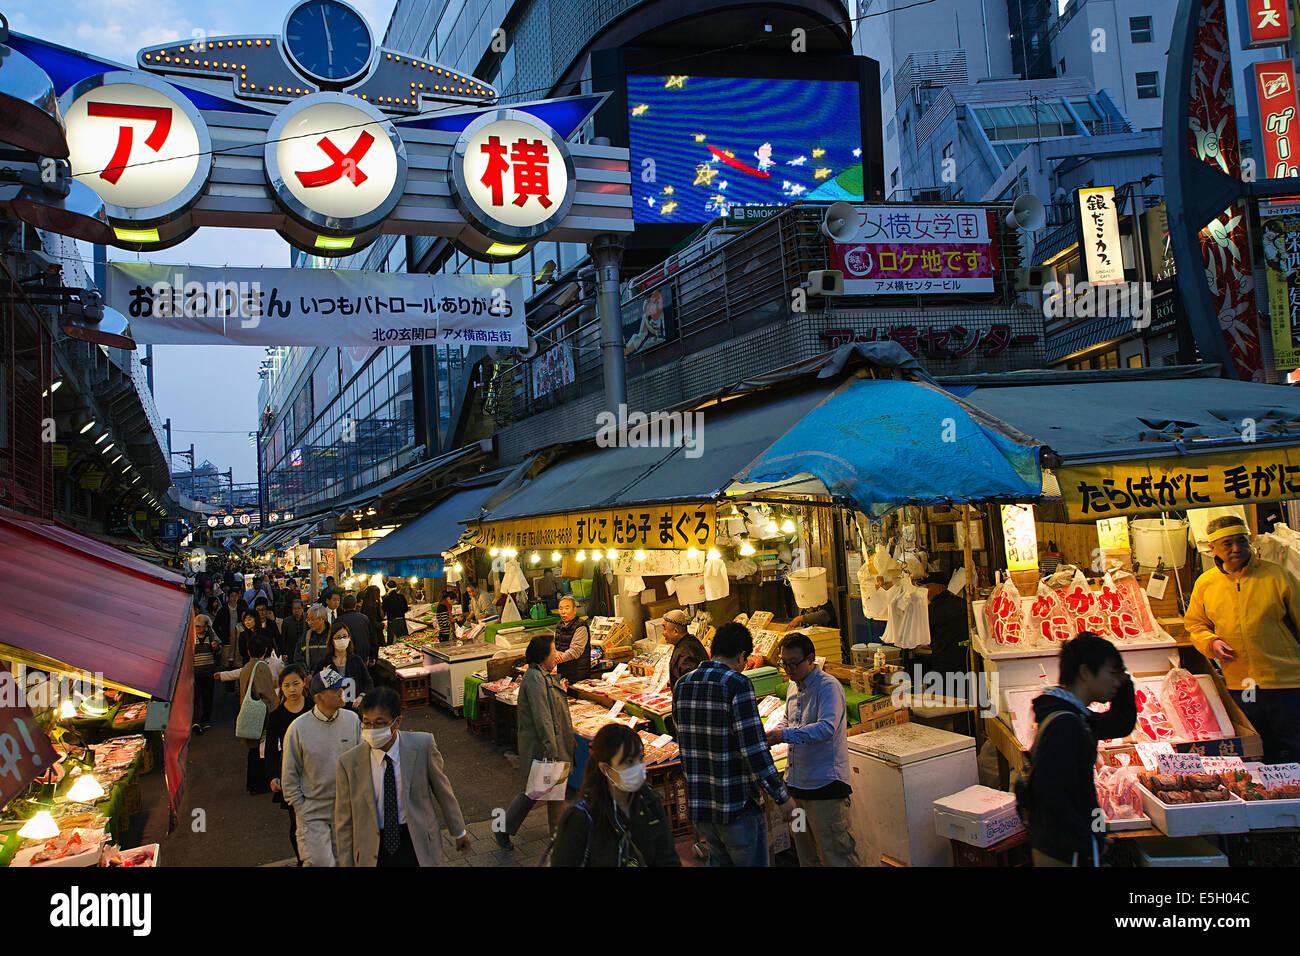 Ueno okachimachi market, Tokyo, Japan. - Stock Image